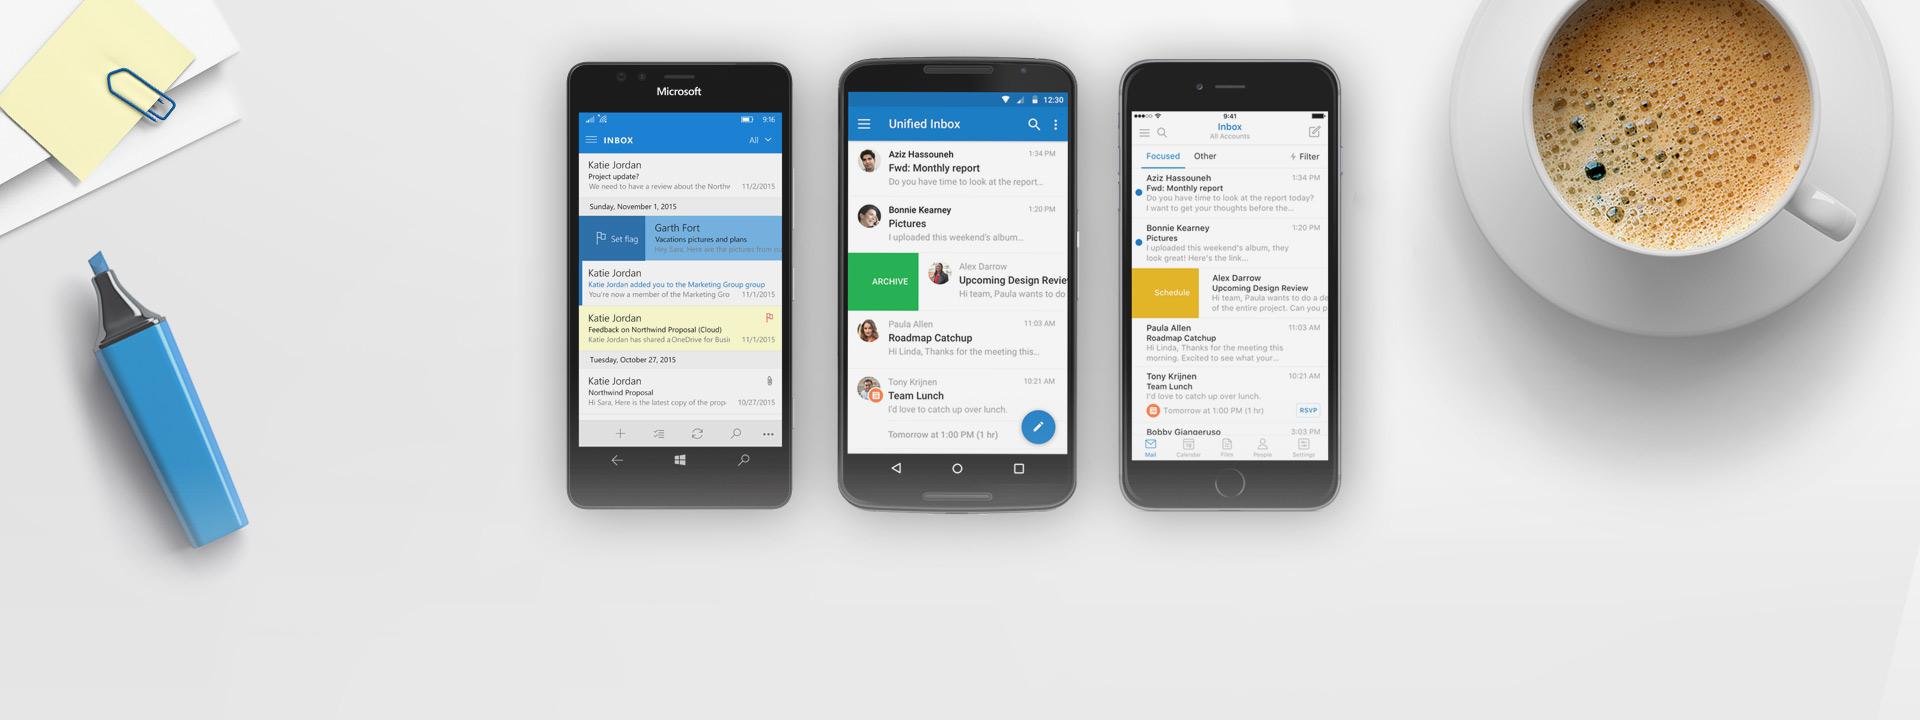 Windows Phone、iPhone 與 Android 手機畫面上都顯示 Outlook App